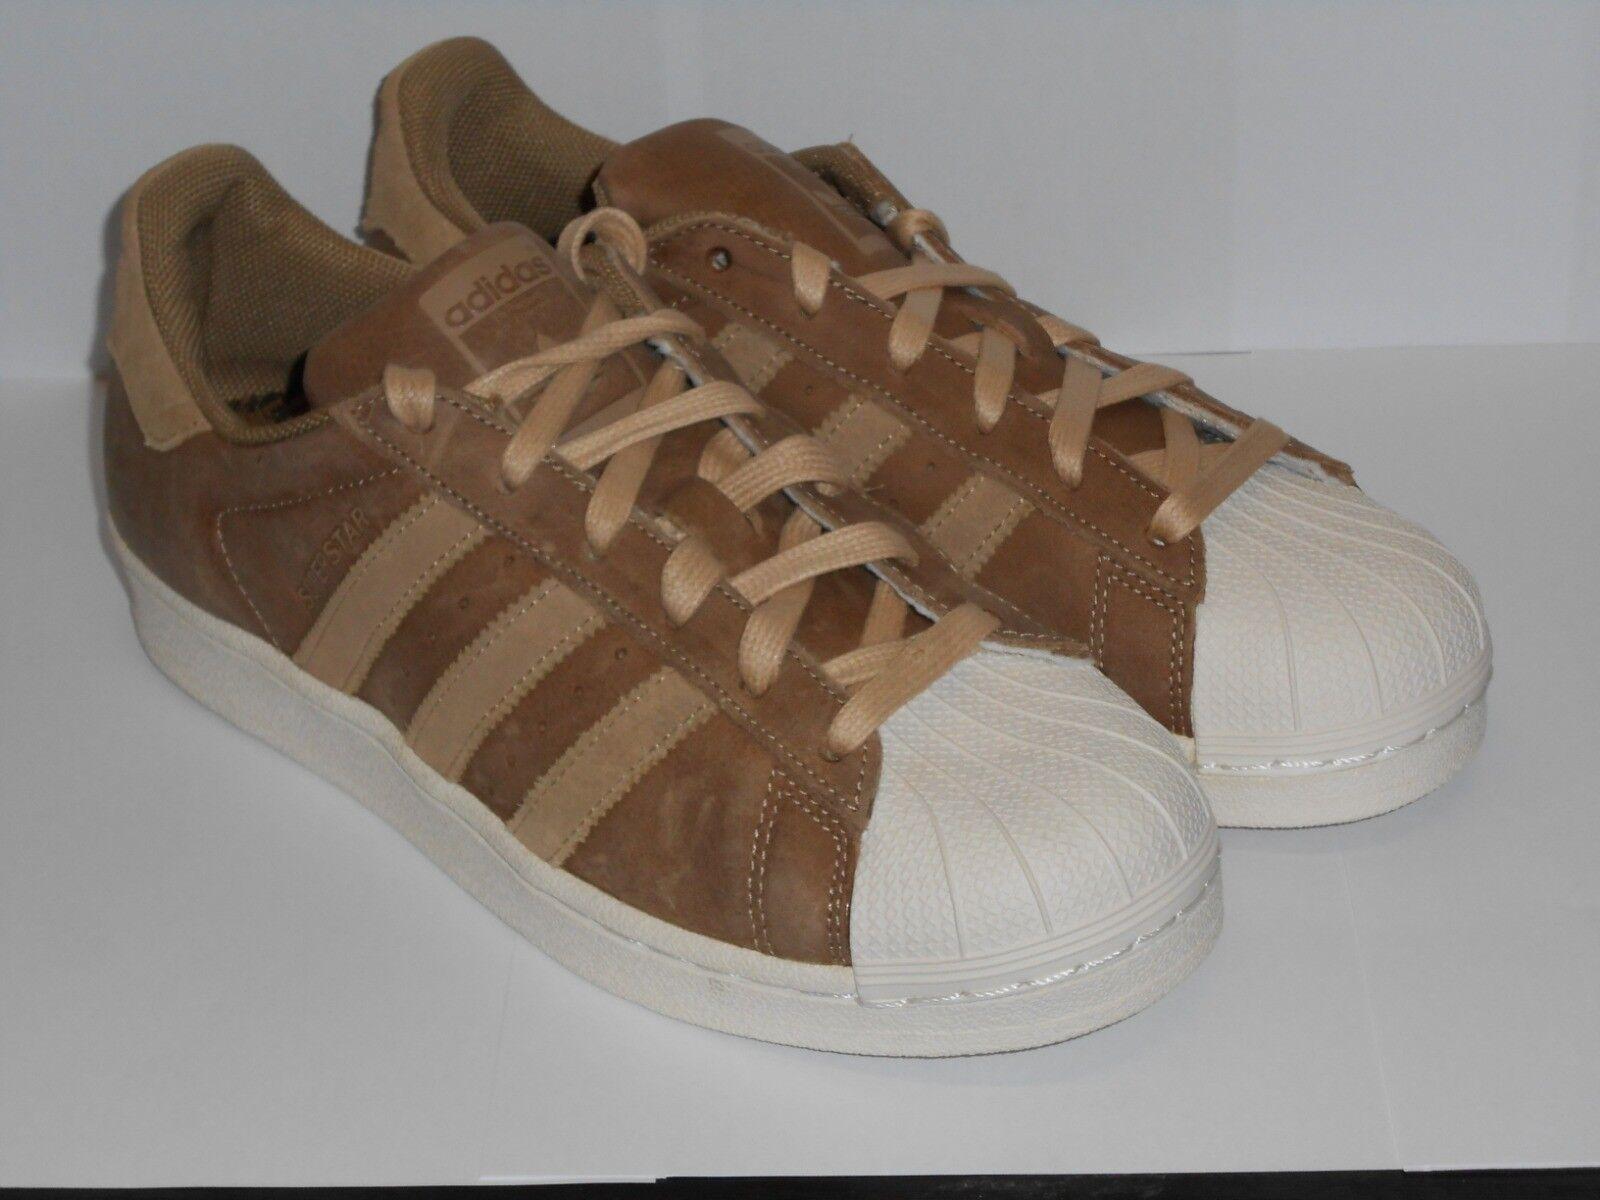 zapato adidas hombre